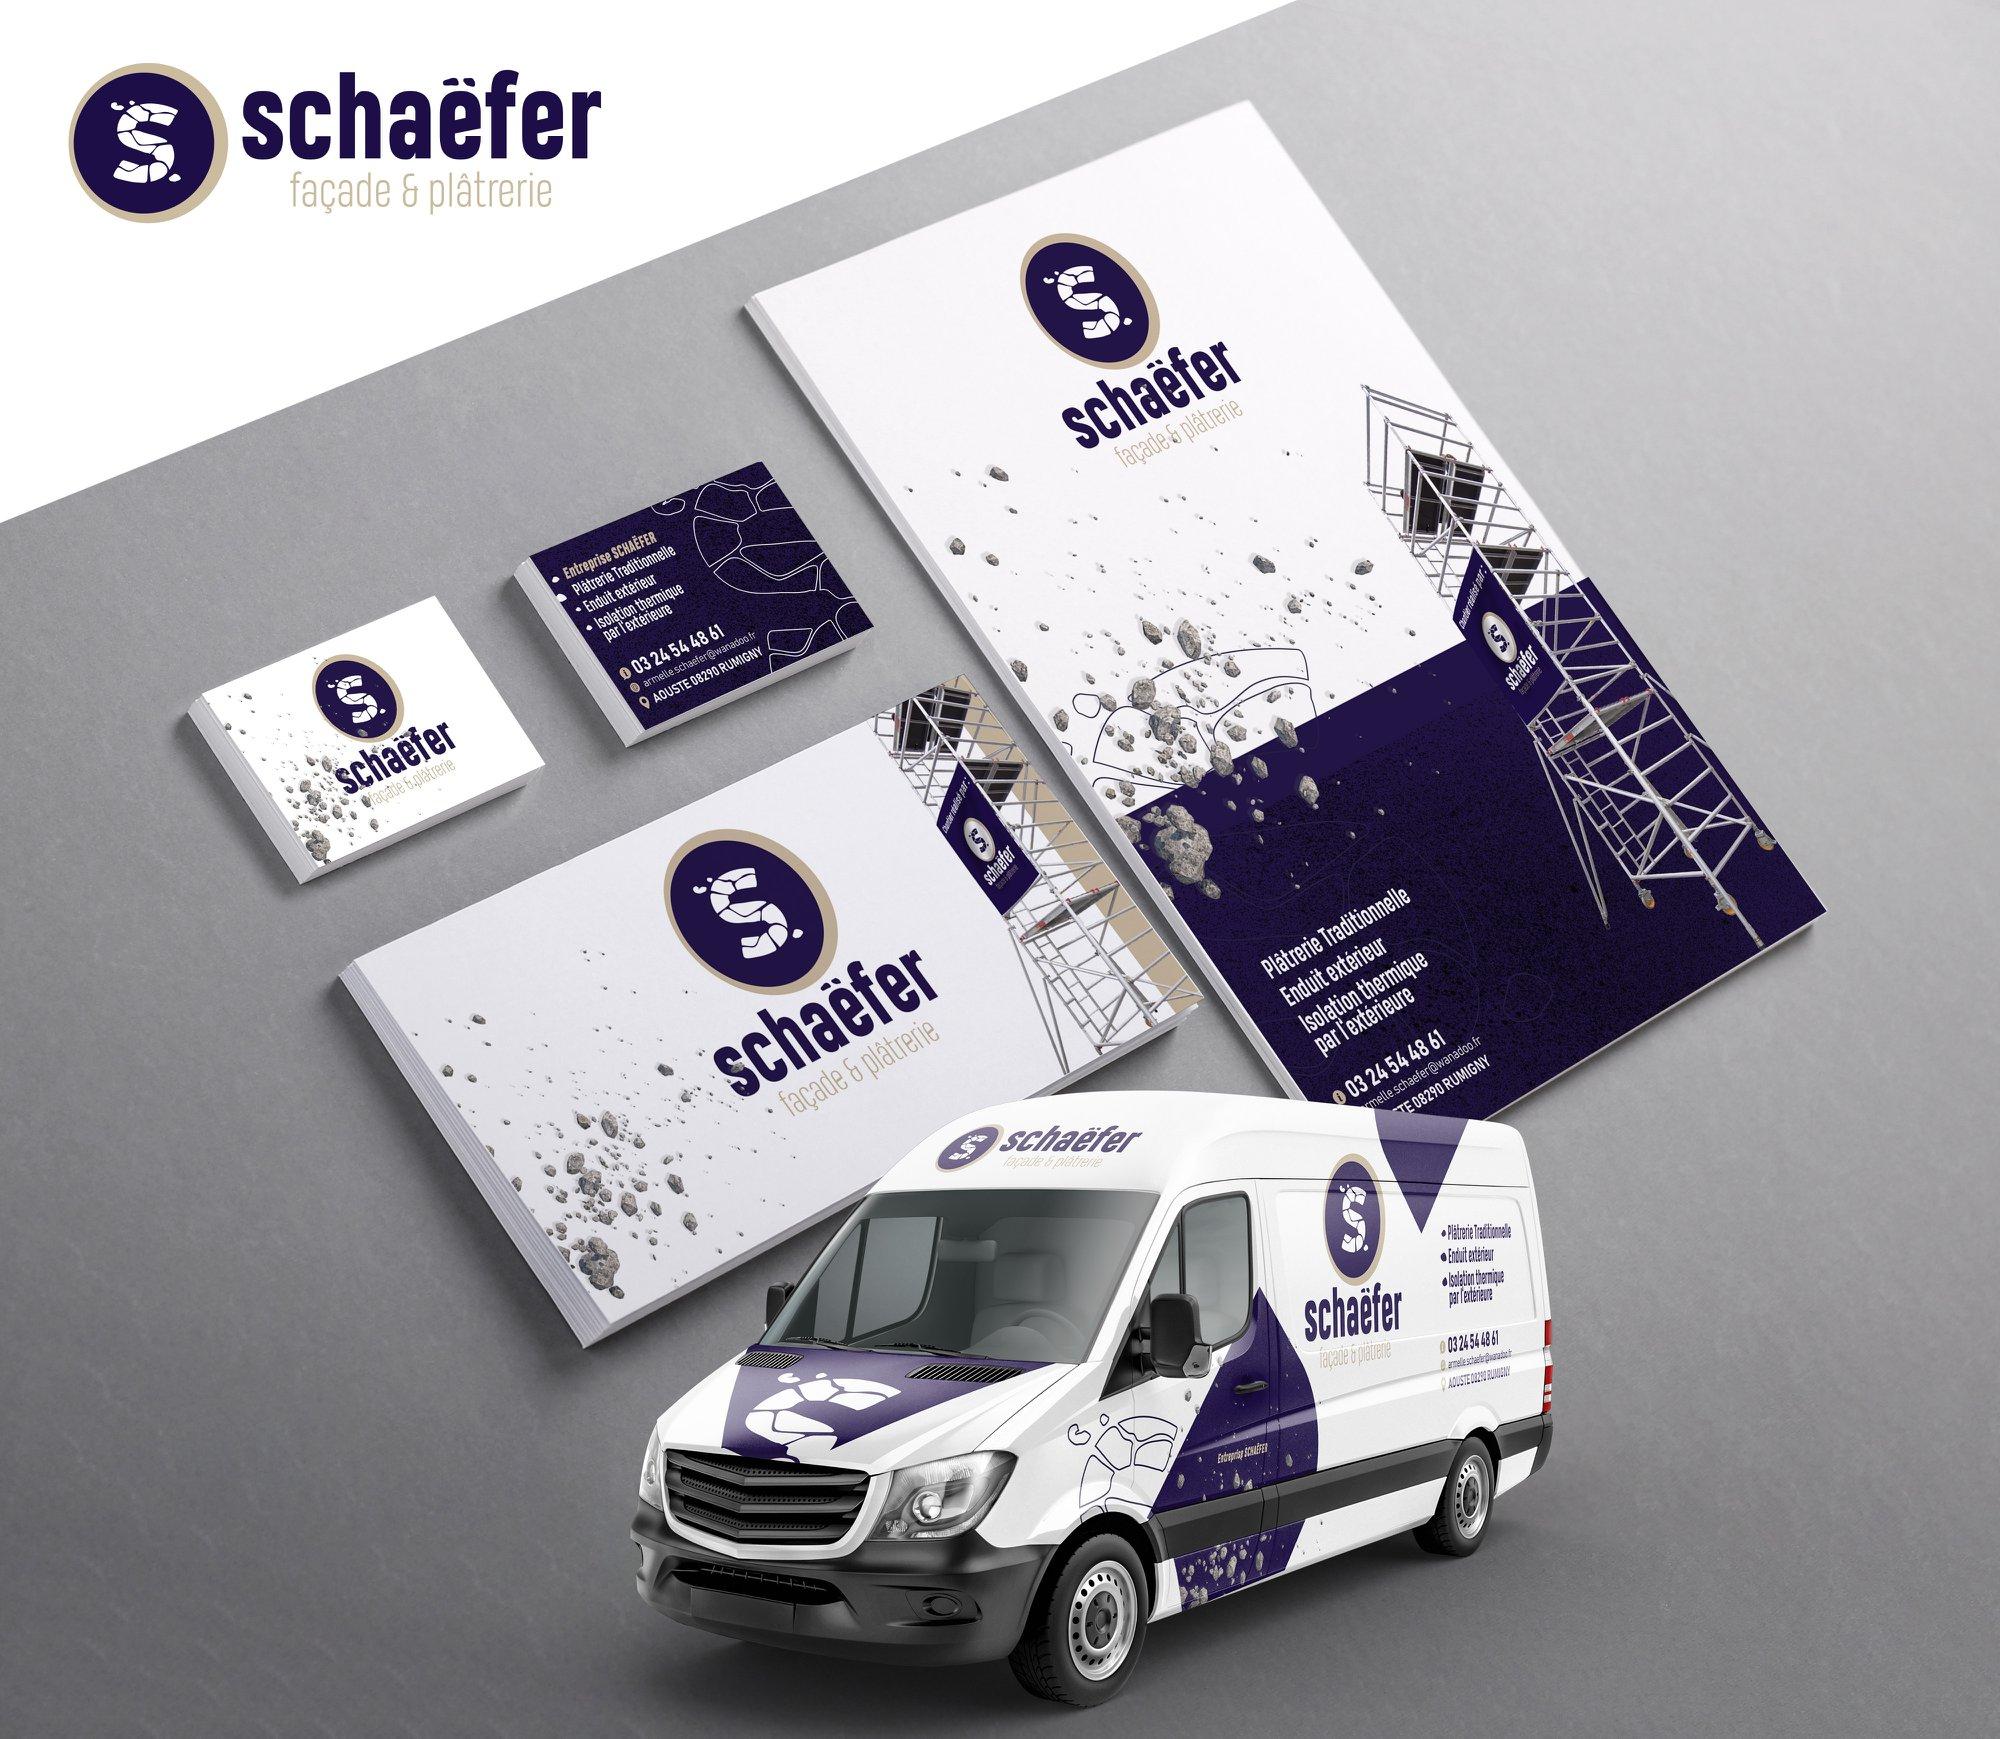 Schaëfer – Façade et Plâtrerie